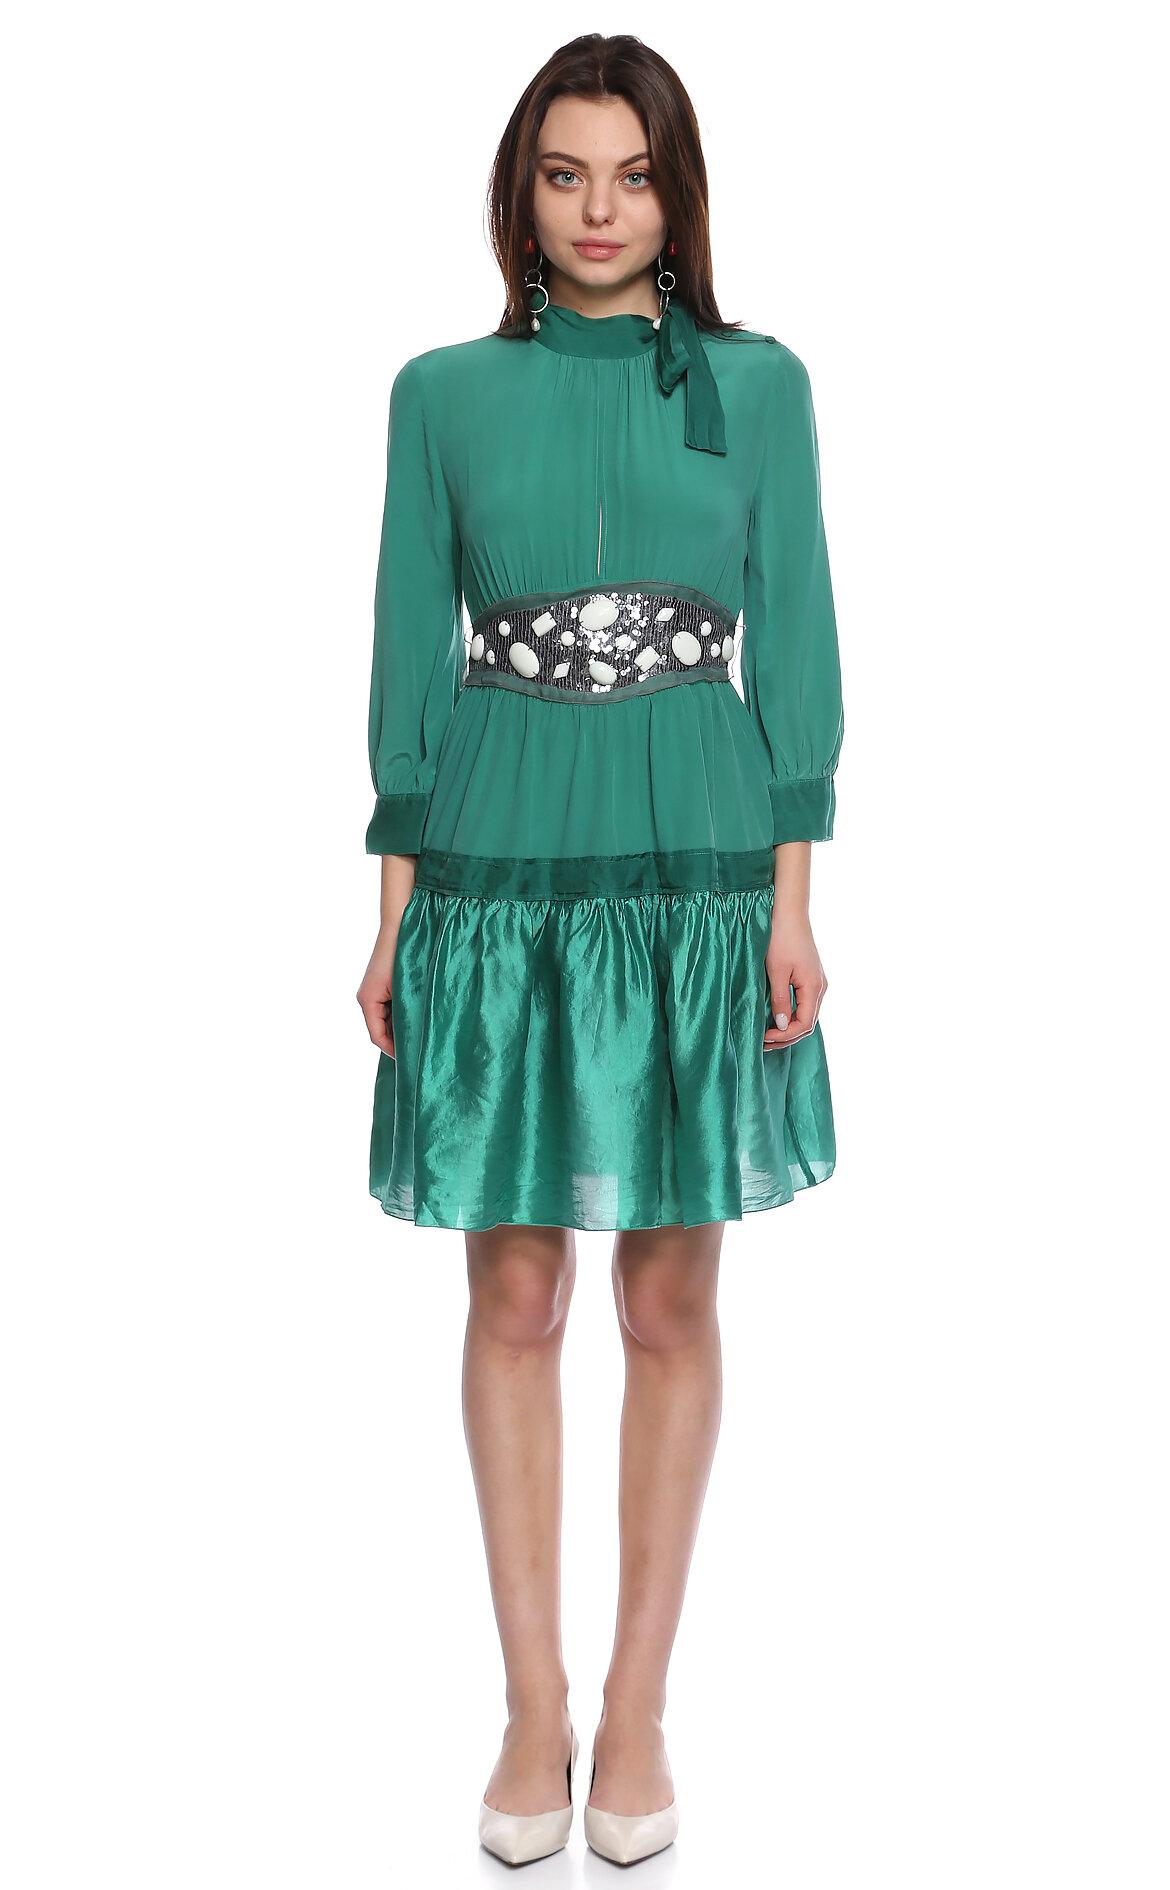 M.Missoni-M.Missoni Fular Yakalı Diz Üstü Yeşil Elbise